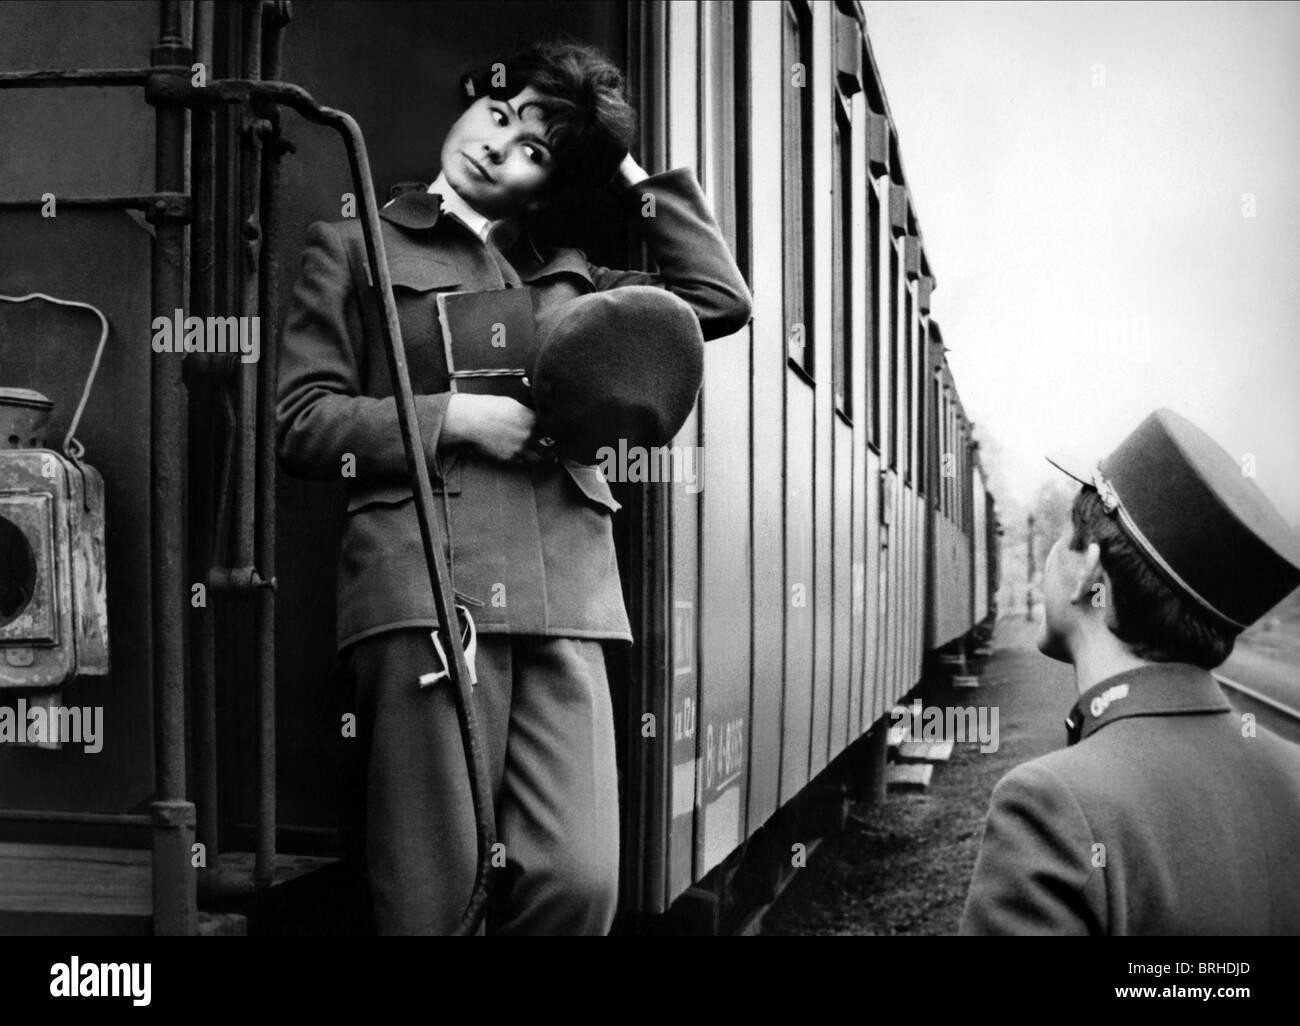 JITKA SCOFFIN, VACLAV NECKAR, CLOSELY OBSERVED TRAINS, 1966 - Stock Image